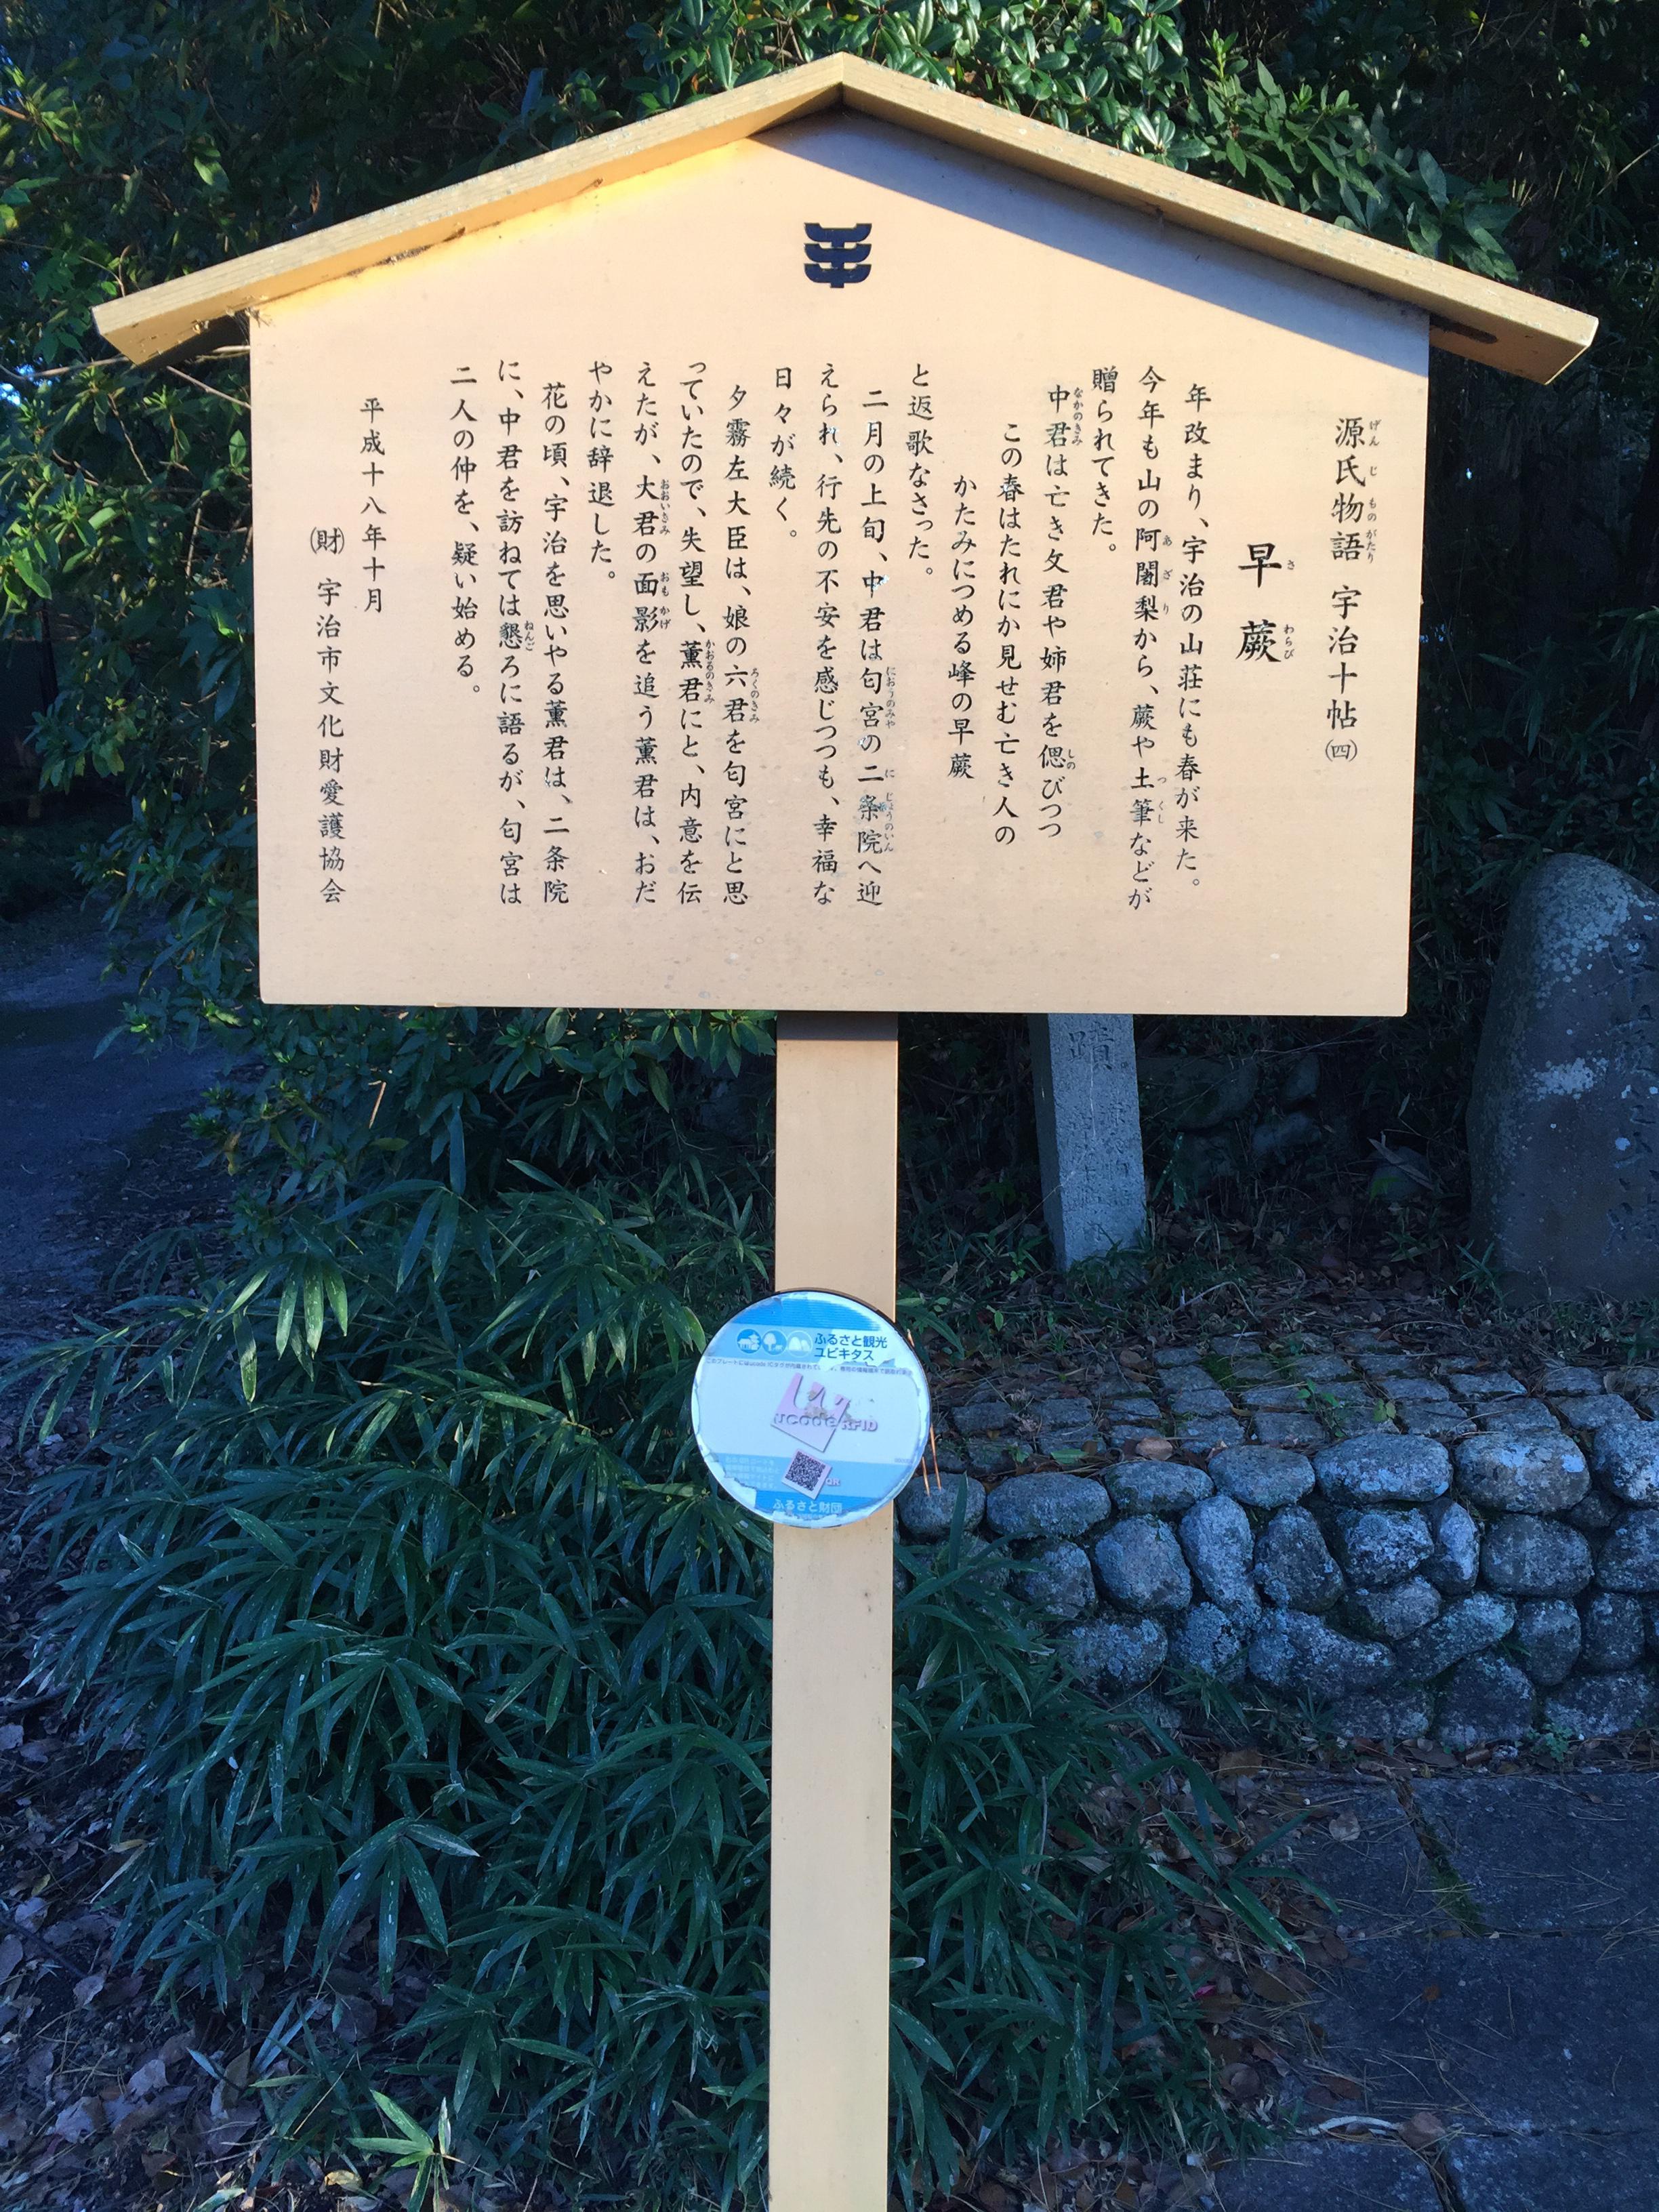 宇治上神社の歴史